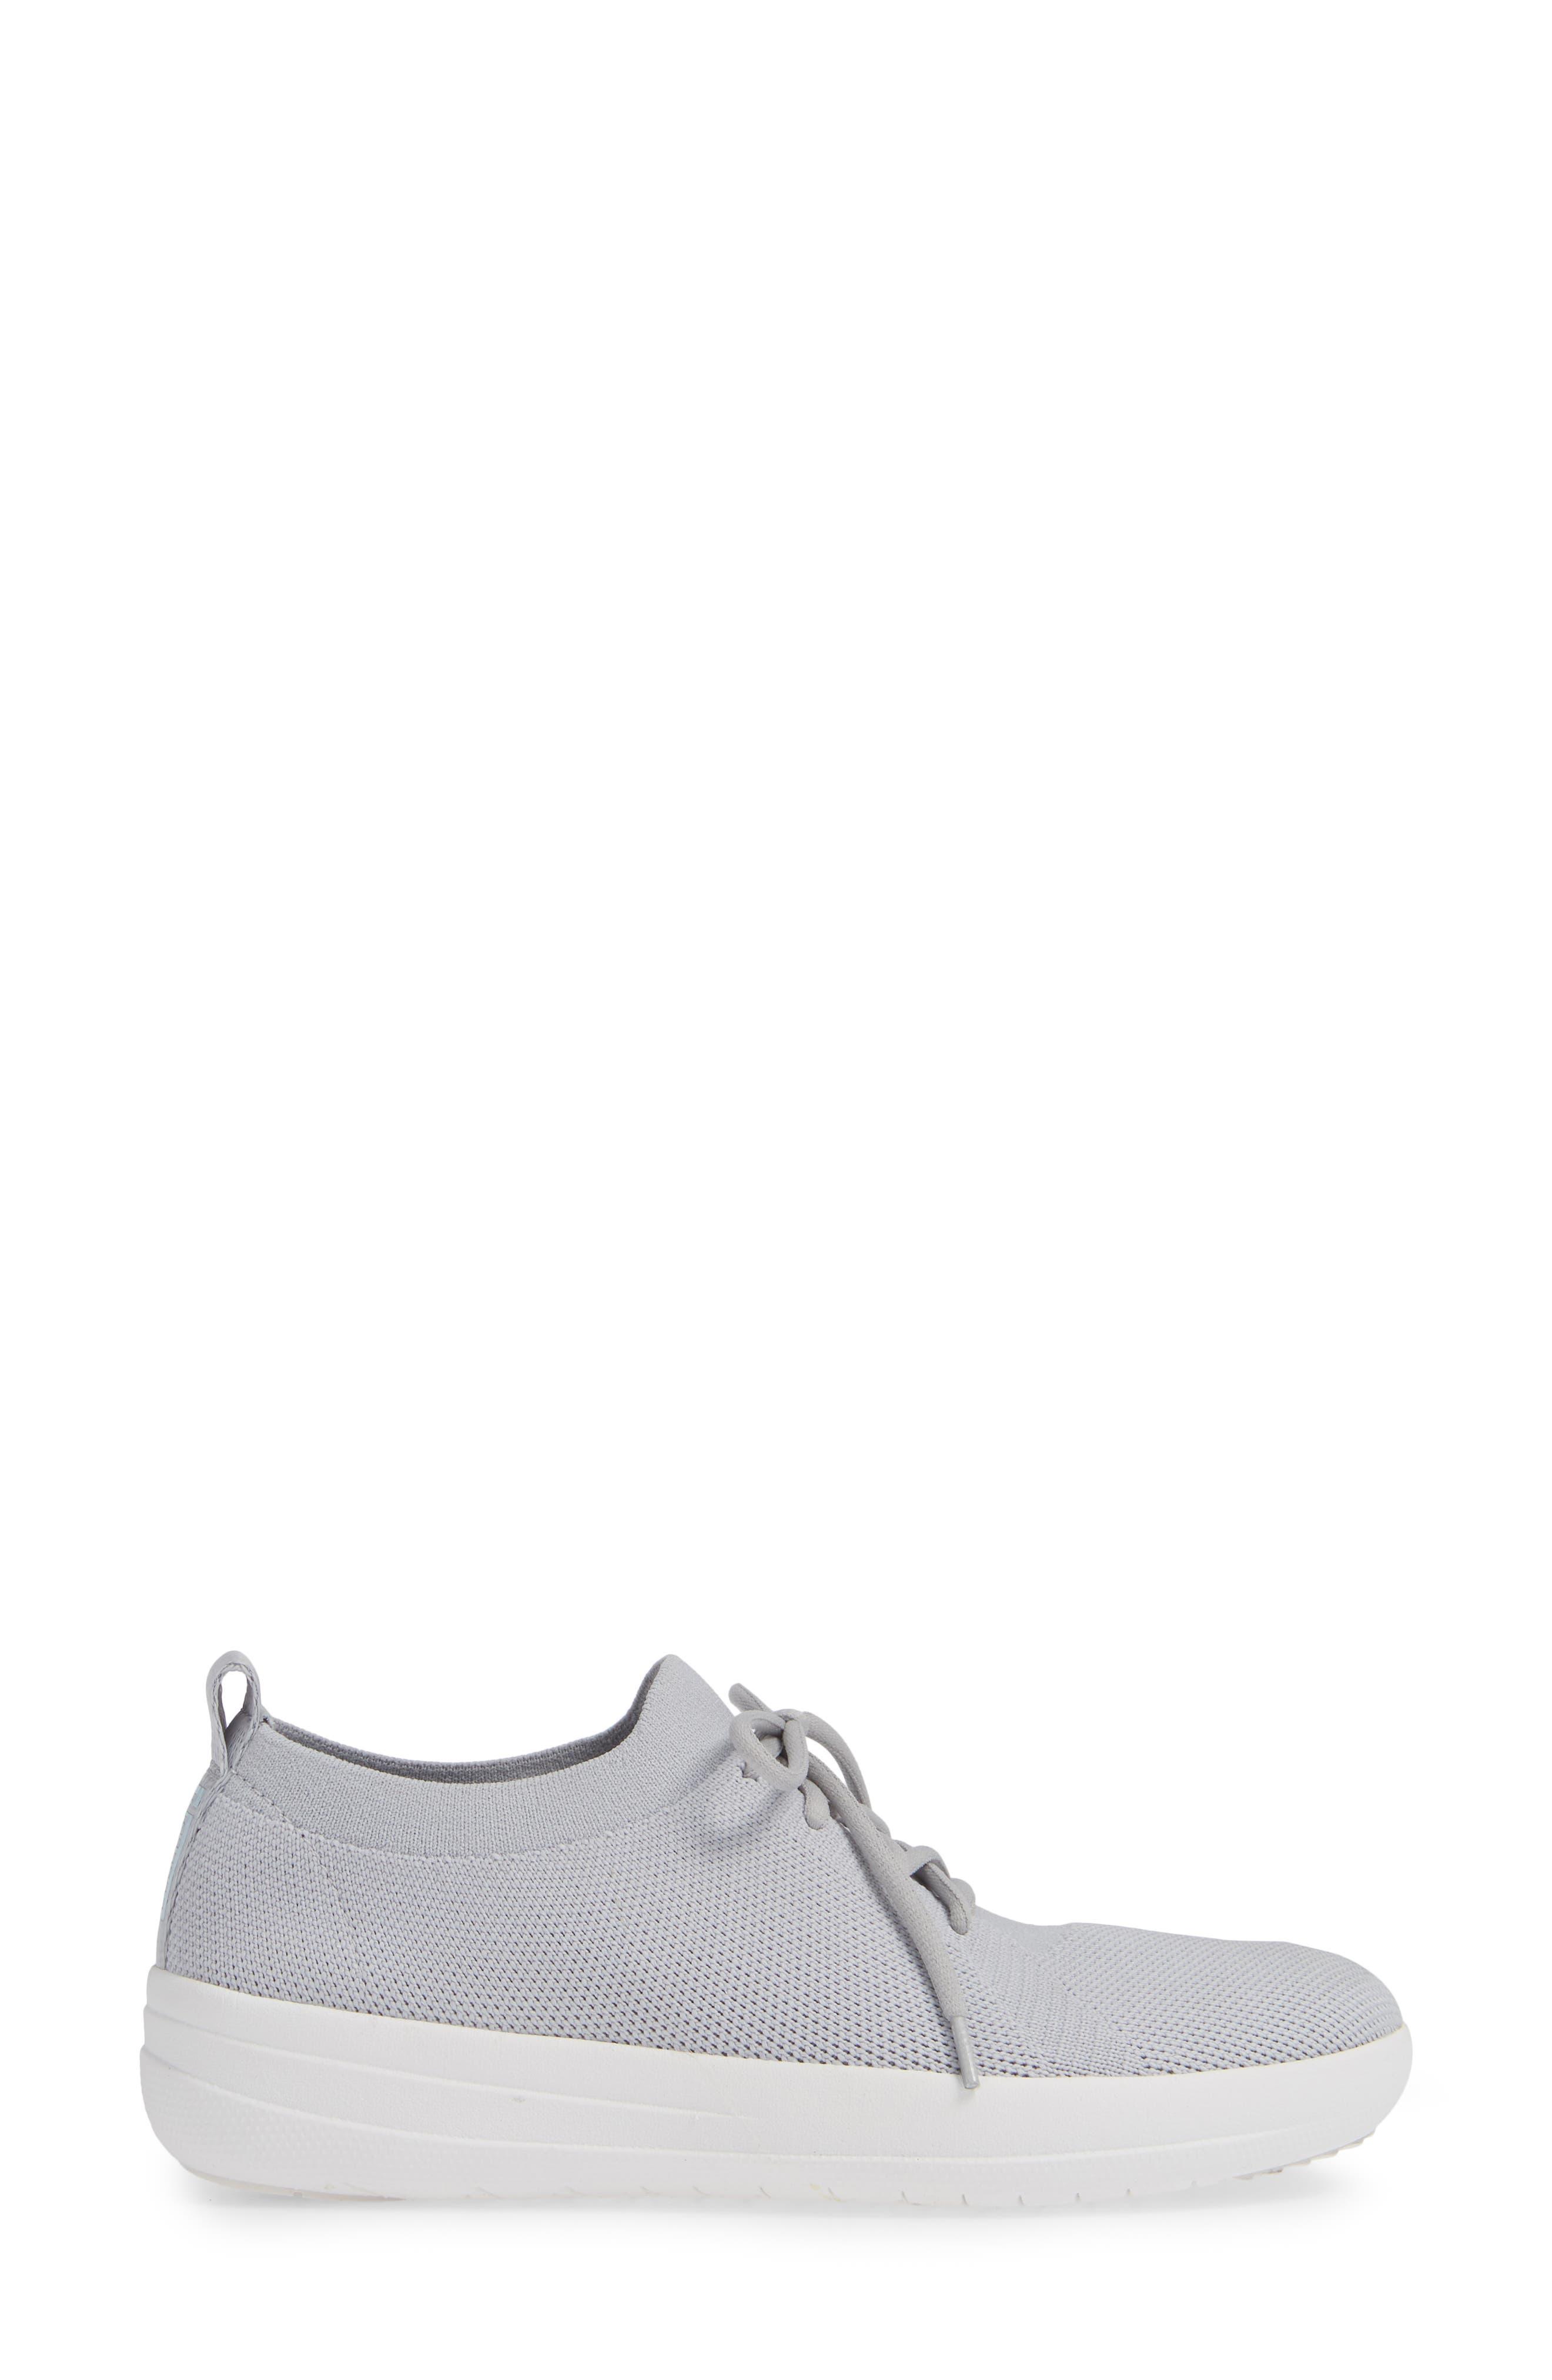 F-Sporty Uberknit<sup>™</sup> Sneaker,                             Alternate thumbnail 3, color,                             PEARL FABRIC